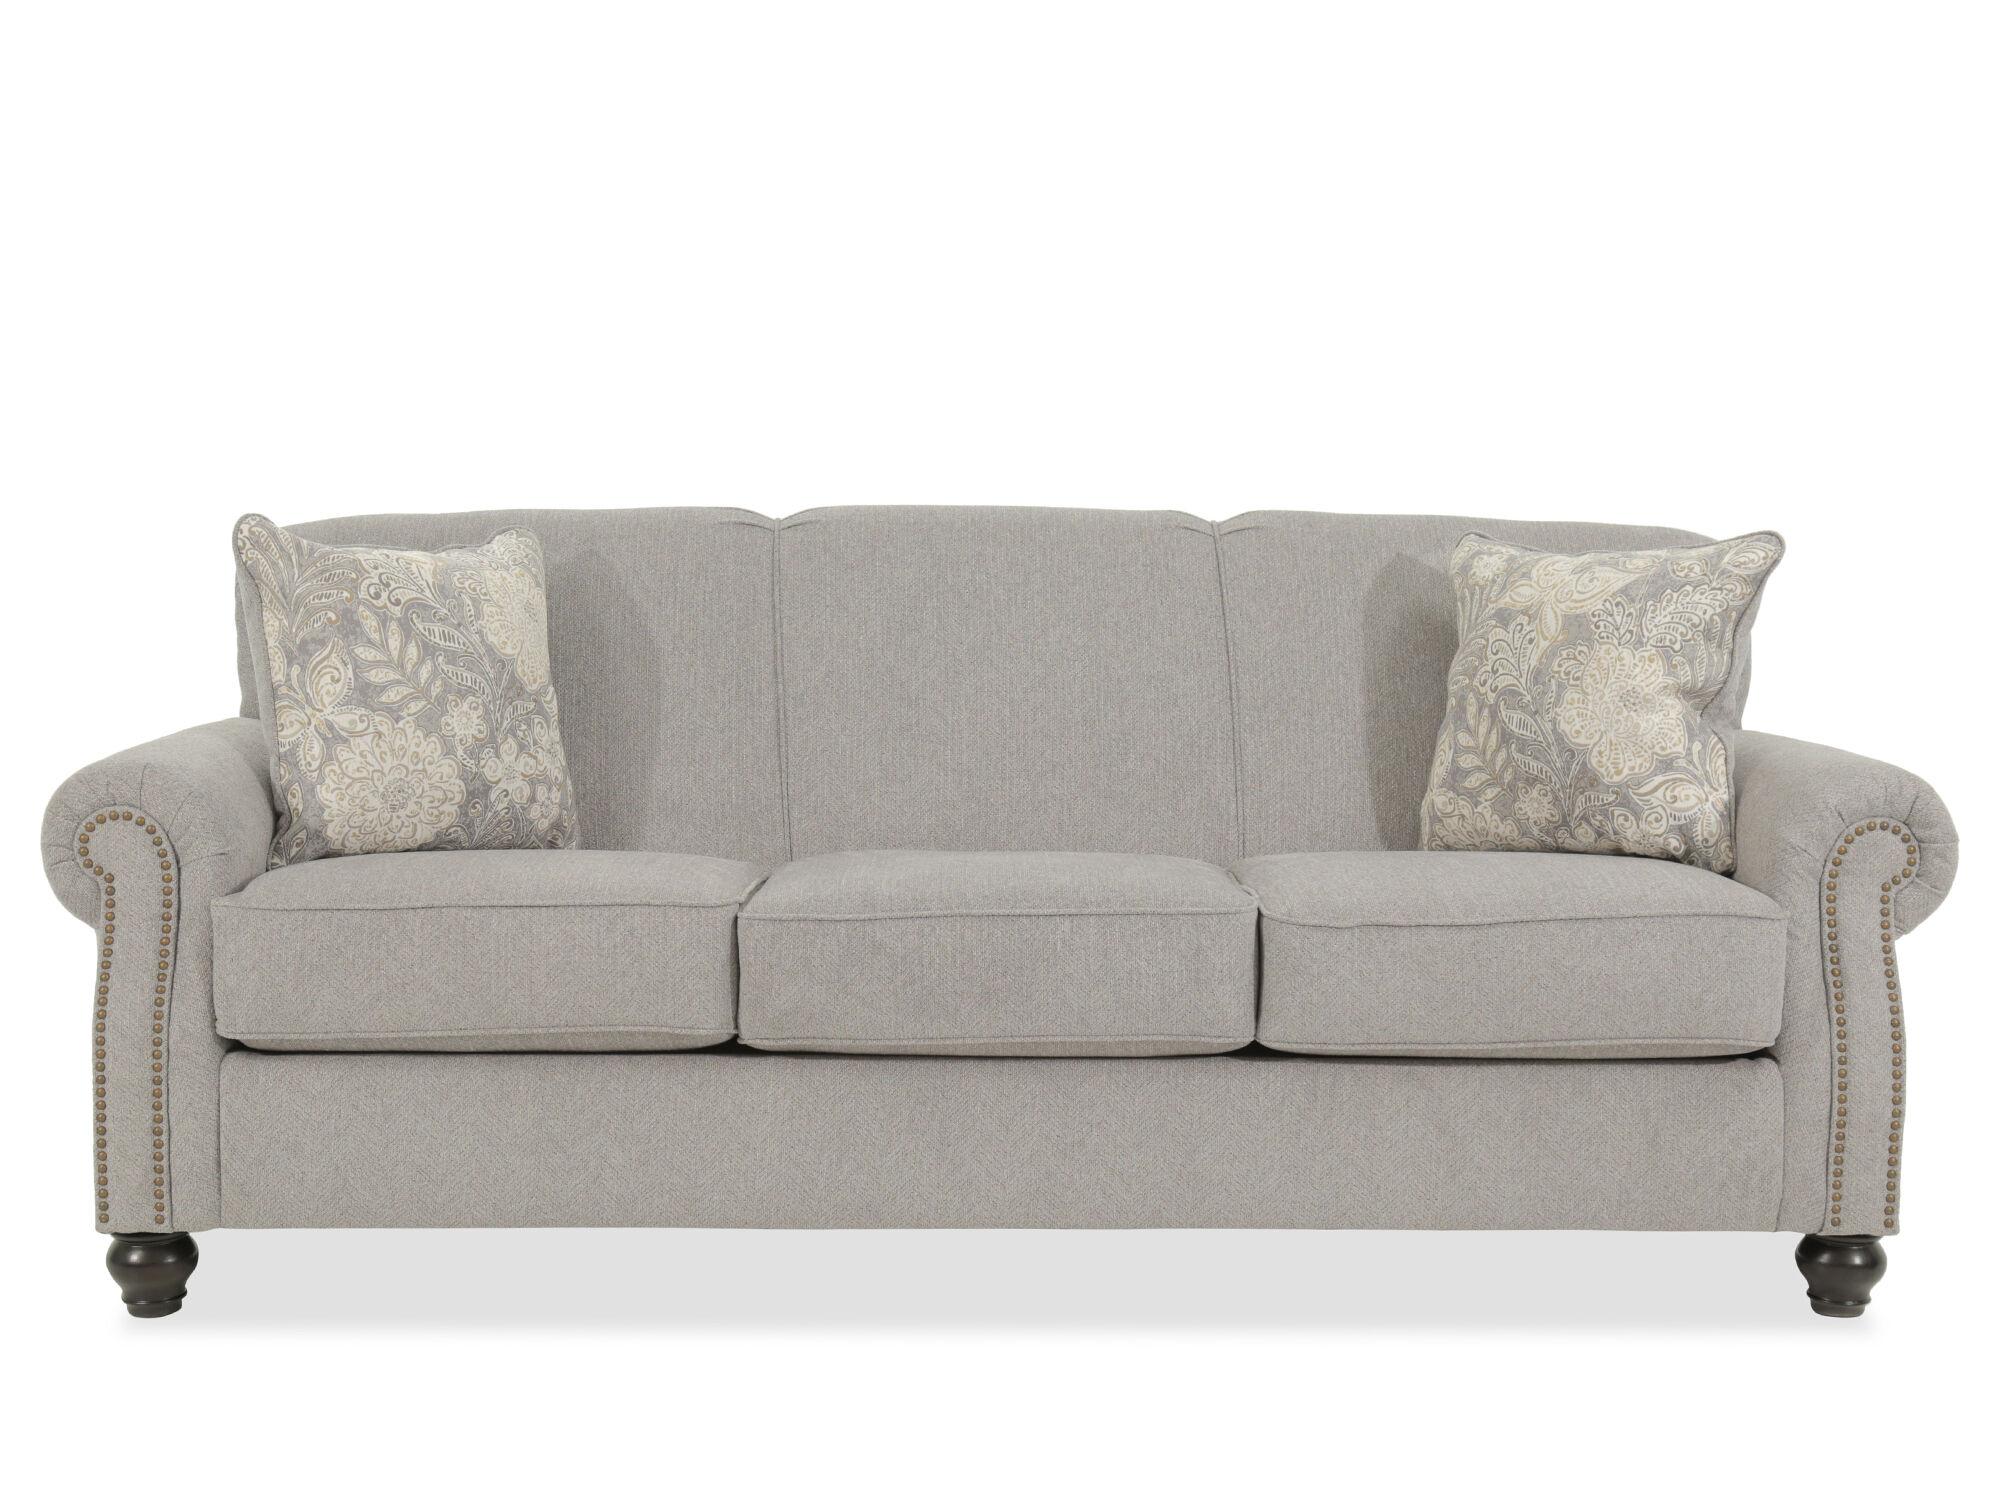 Superbe Contemporary Nailhead Accented 92u0026quot; Sofa ...